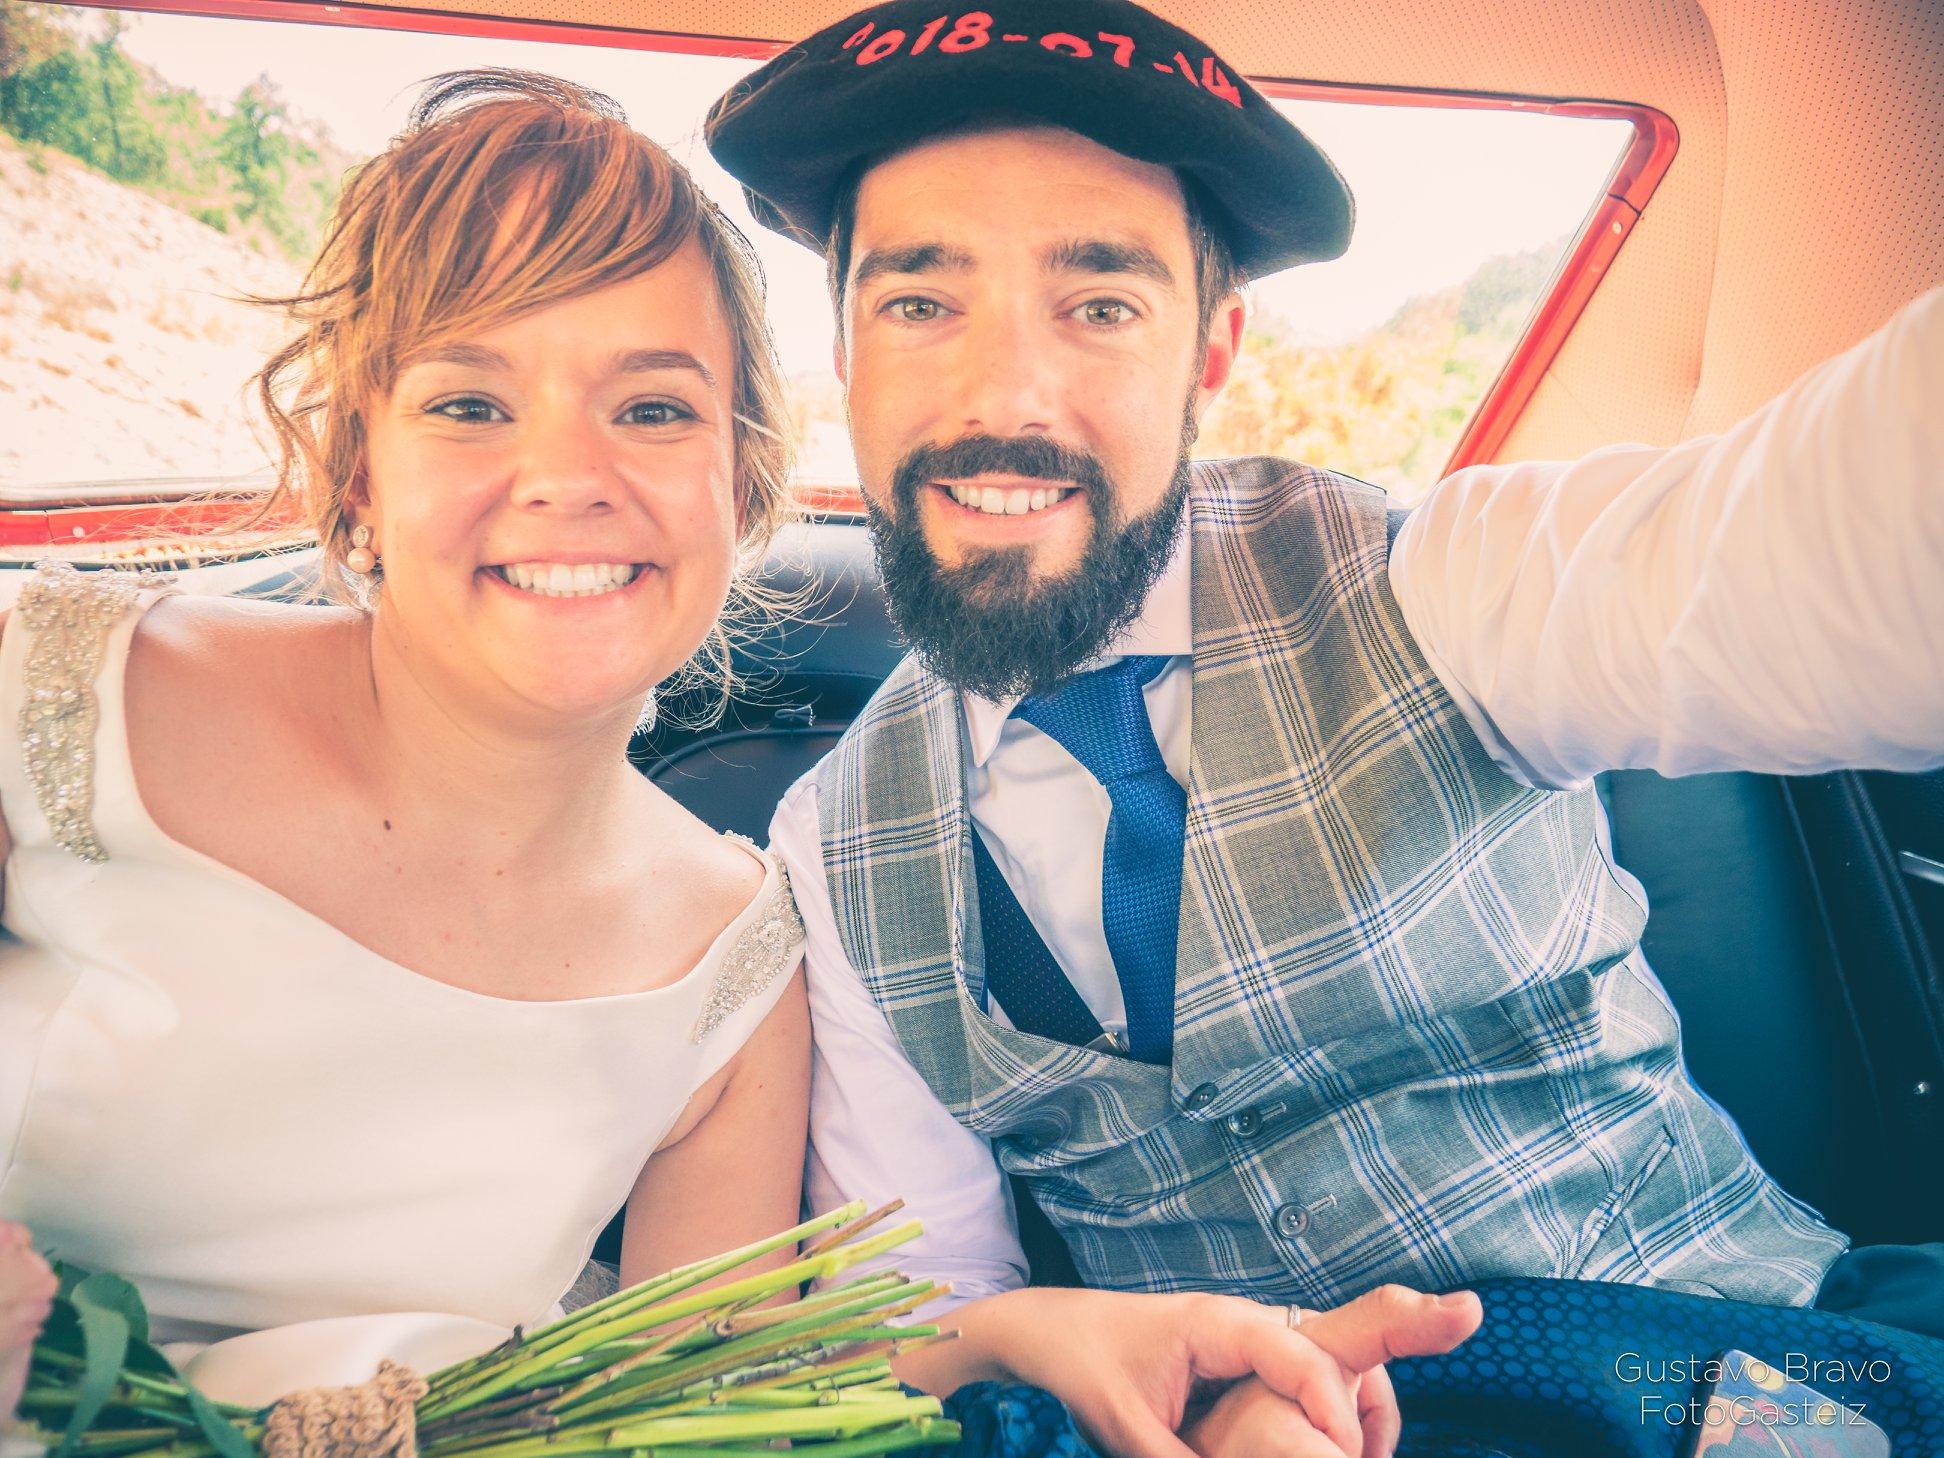 Vídeo de la boda de los fotogasteiztarras Mirari e Iván